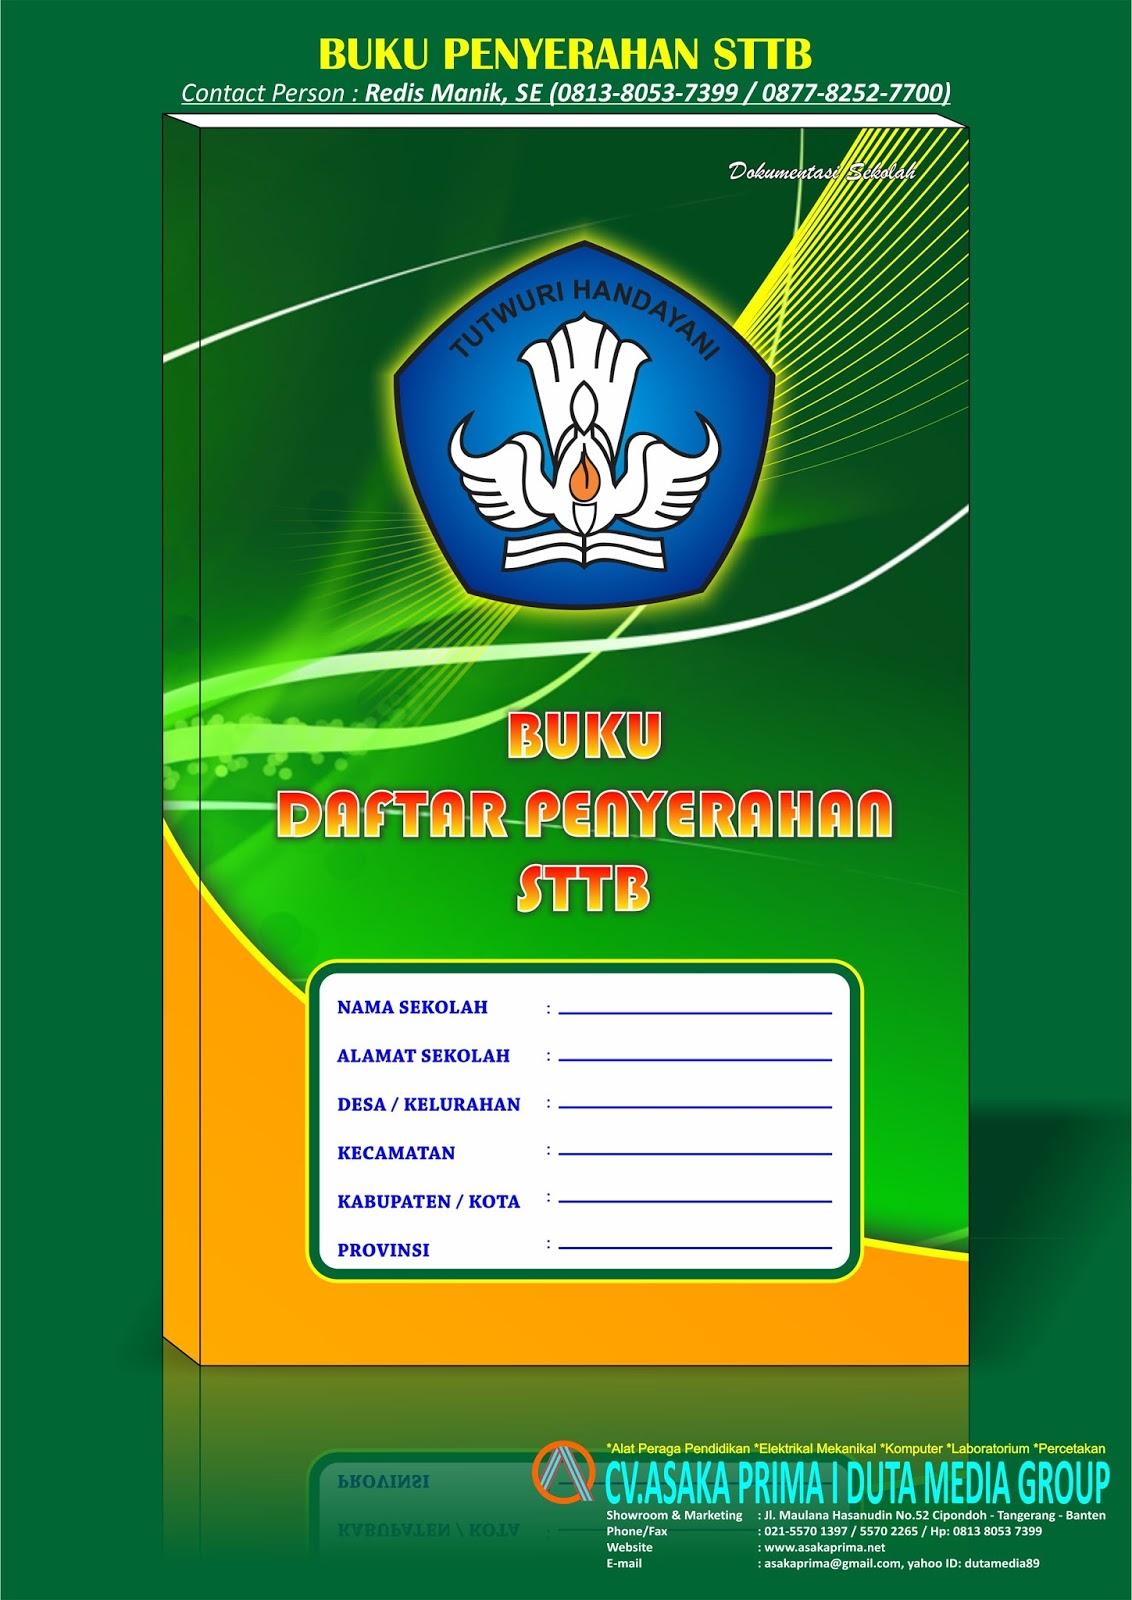 Jual Buku Administrasi Sekolah Induk Siswa Smp Sma Smk Sd Tk Alat Peraga Edukatif